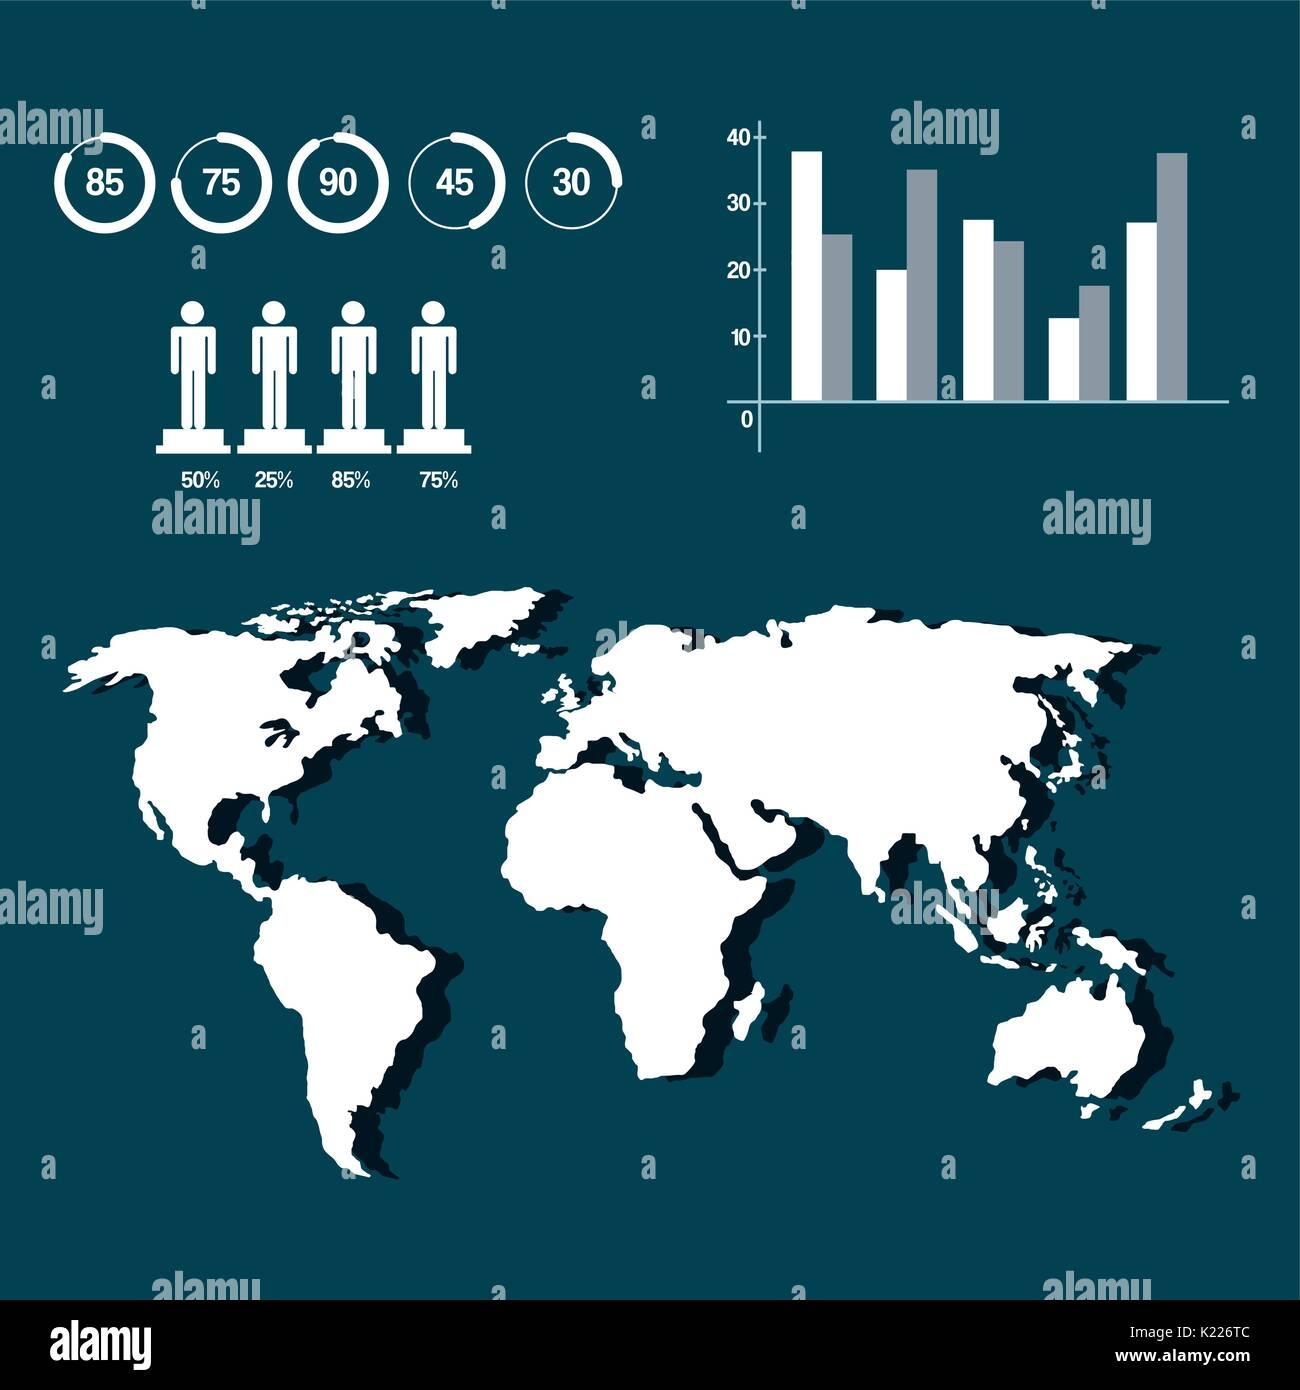 World map infographic demographic statistics presentation stock world map infographic demographic statistics presentation gumiabroncs Images